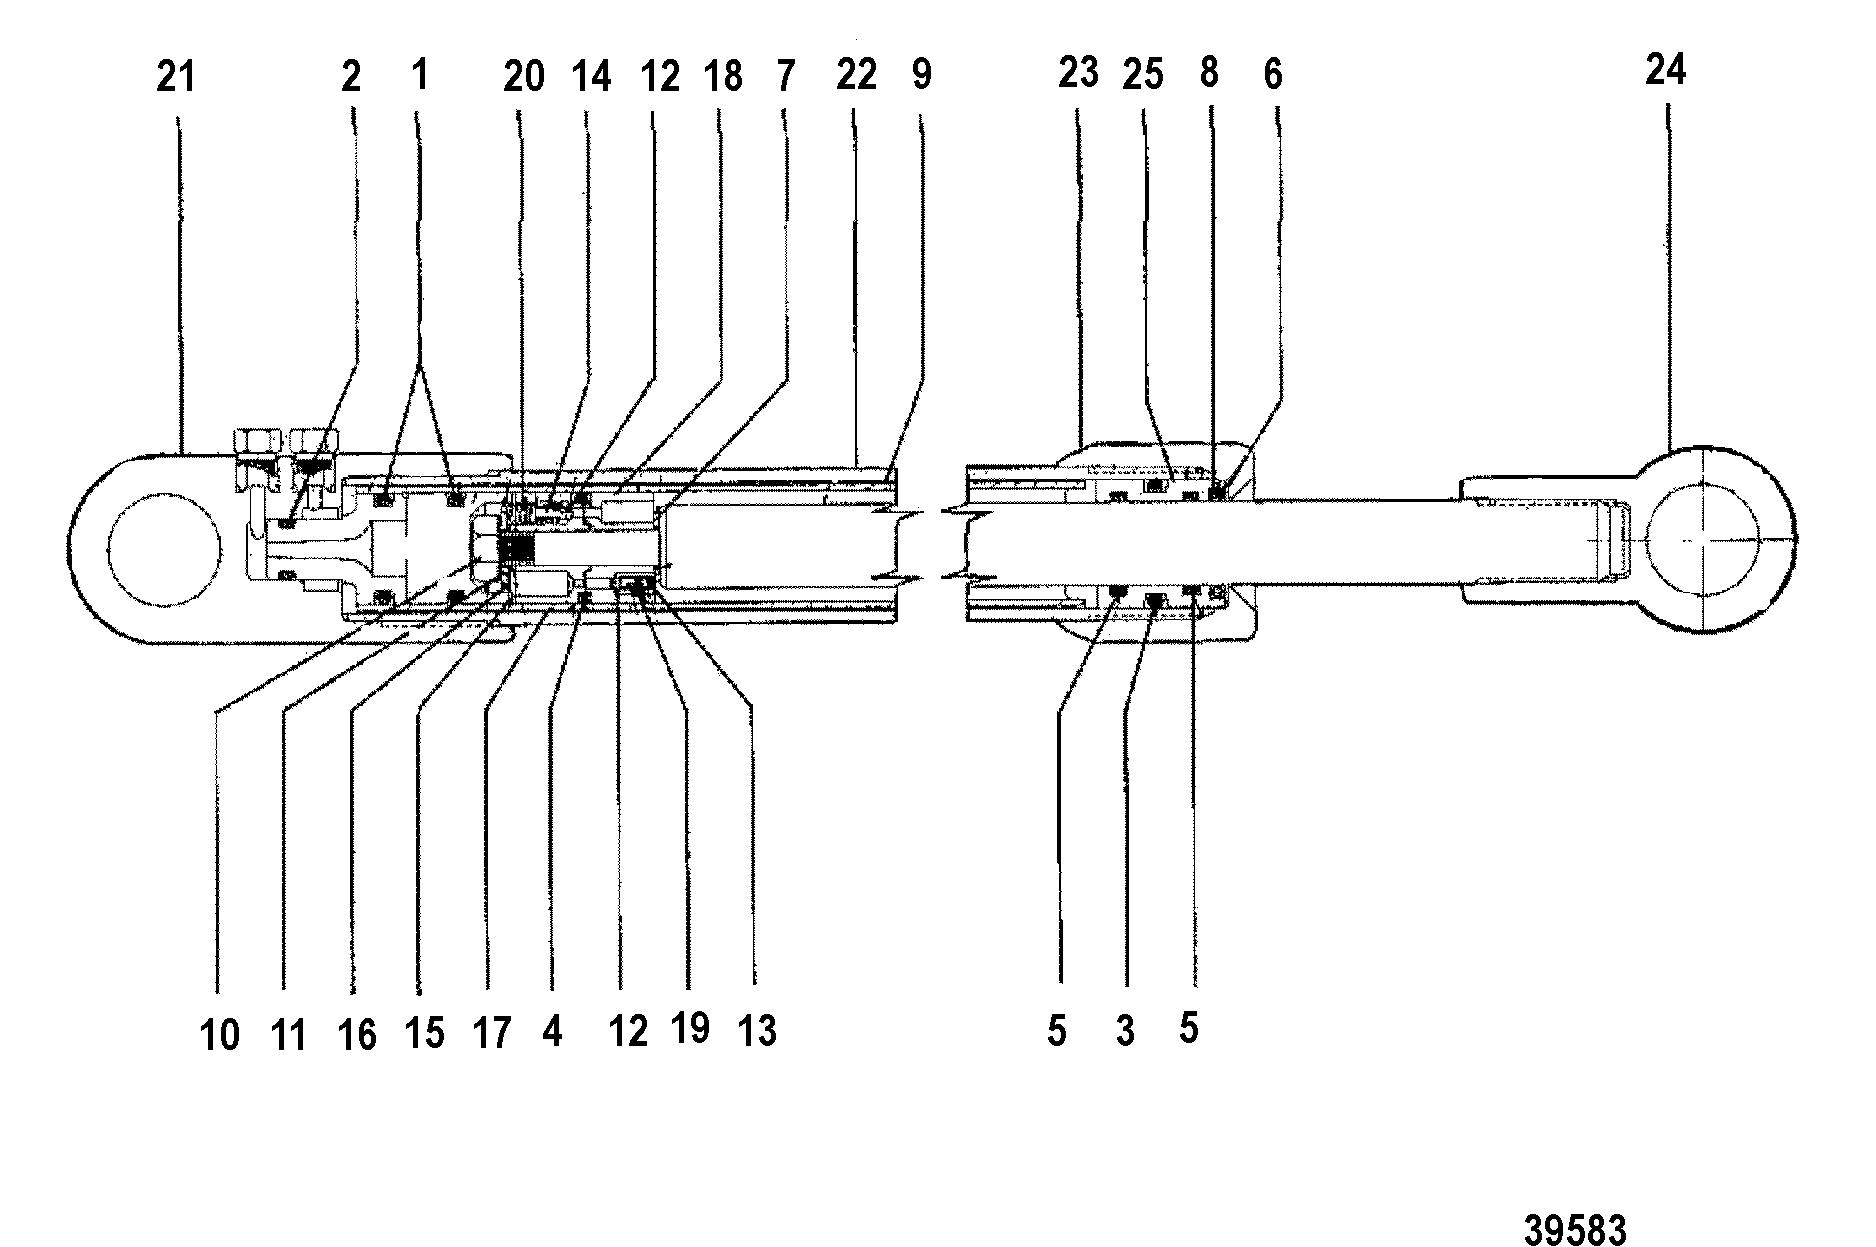 1969 john deere 140 wiring diagram rv battery disconnect switch 165 mercruiser engine